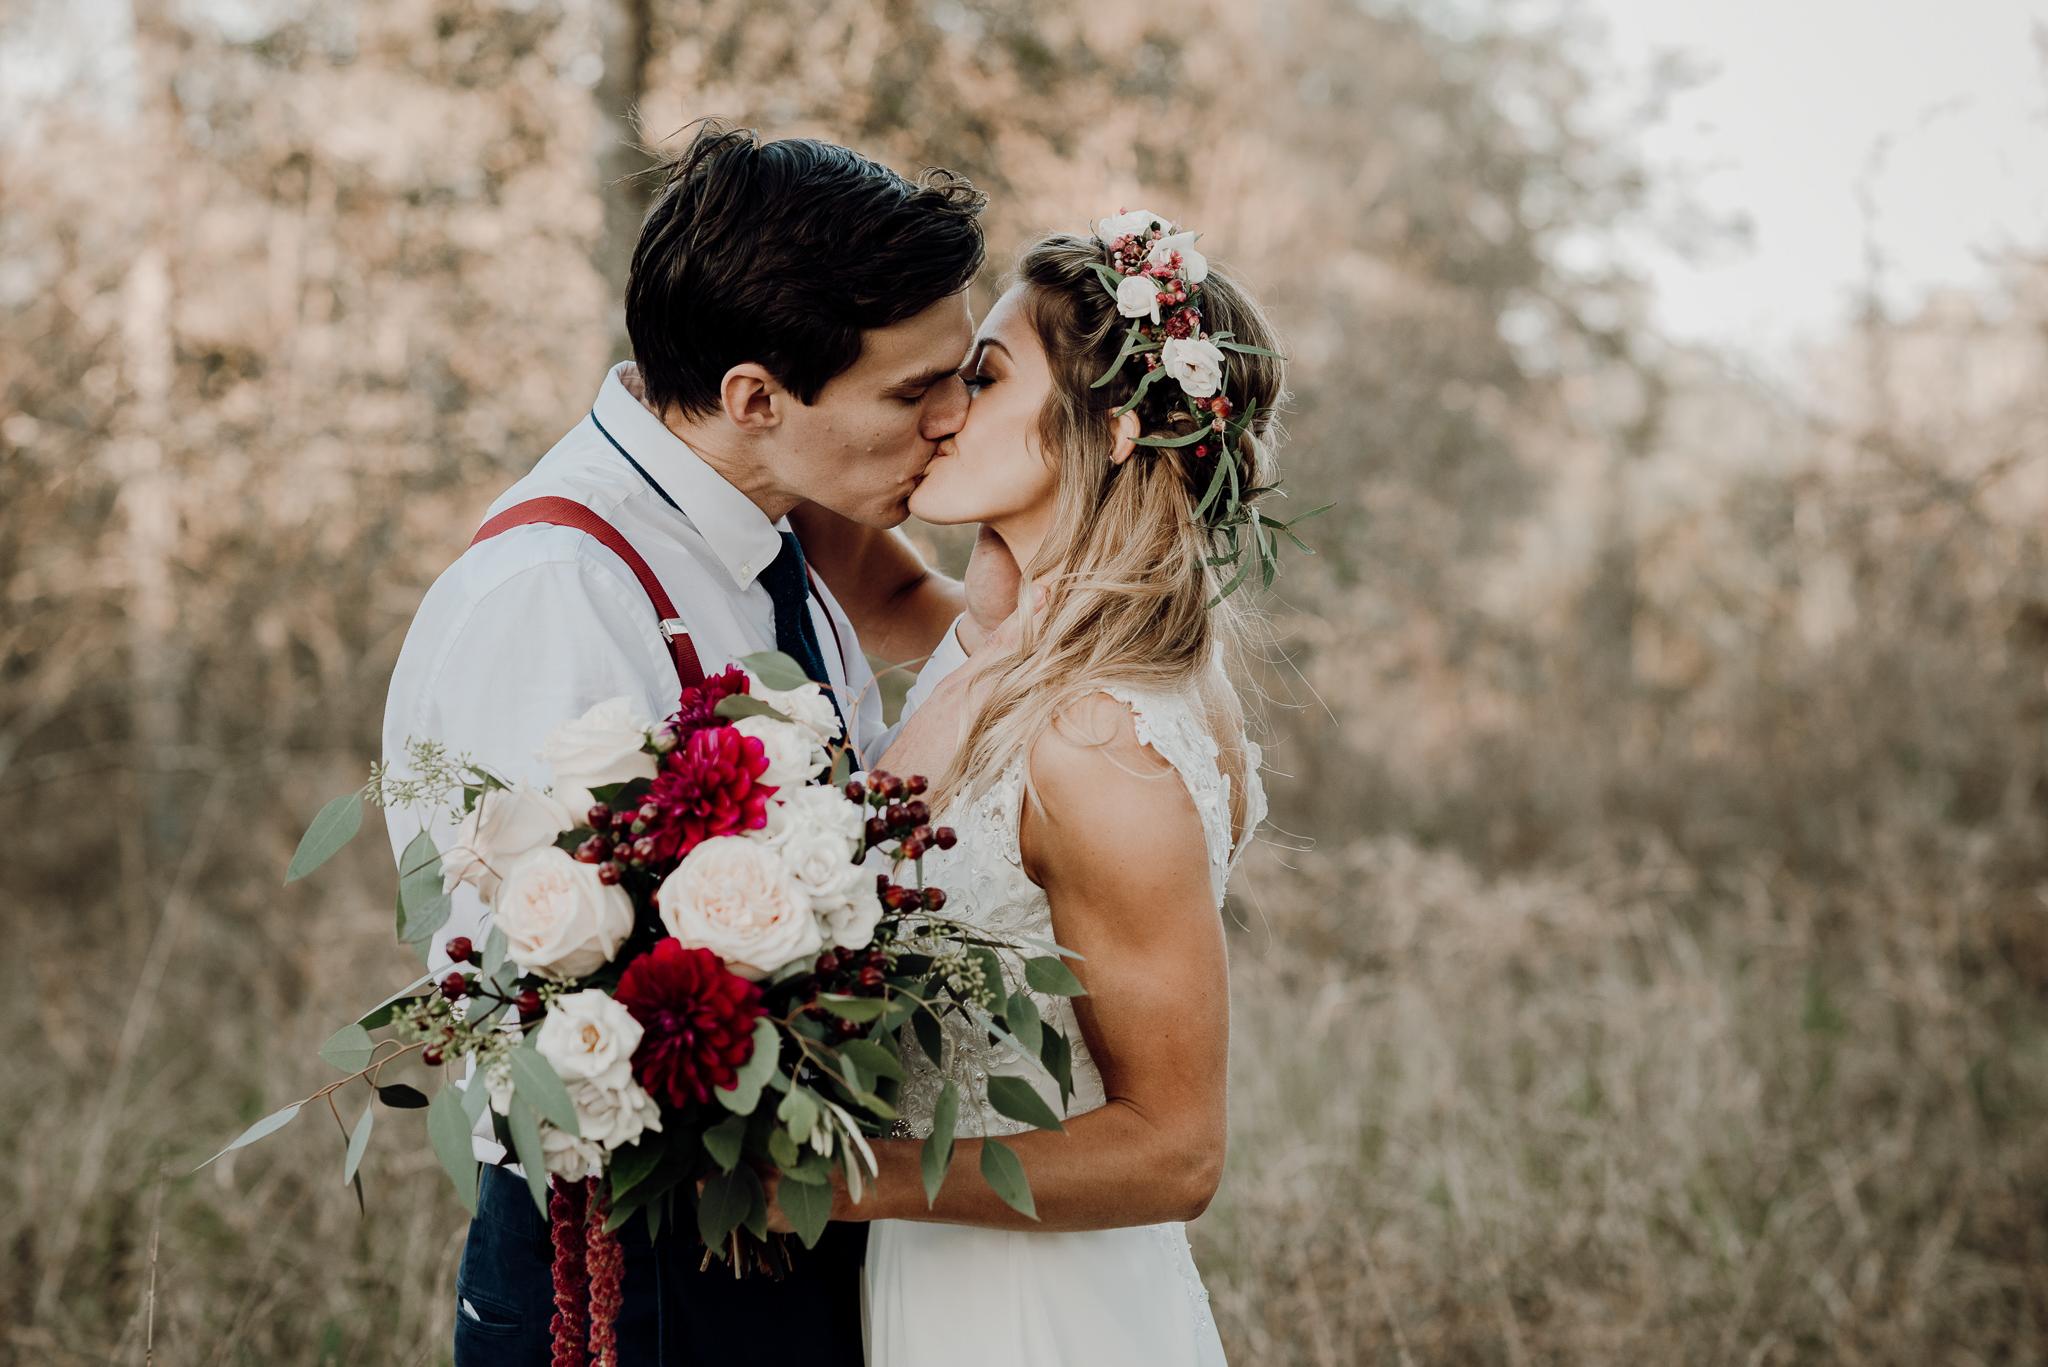 Michelle + Aron-Houston Wedding Photographer-Magnolia Meadows-Winter Wedding | Kristen Giles Photography - 060.jpg